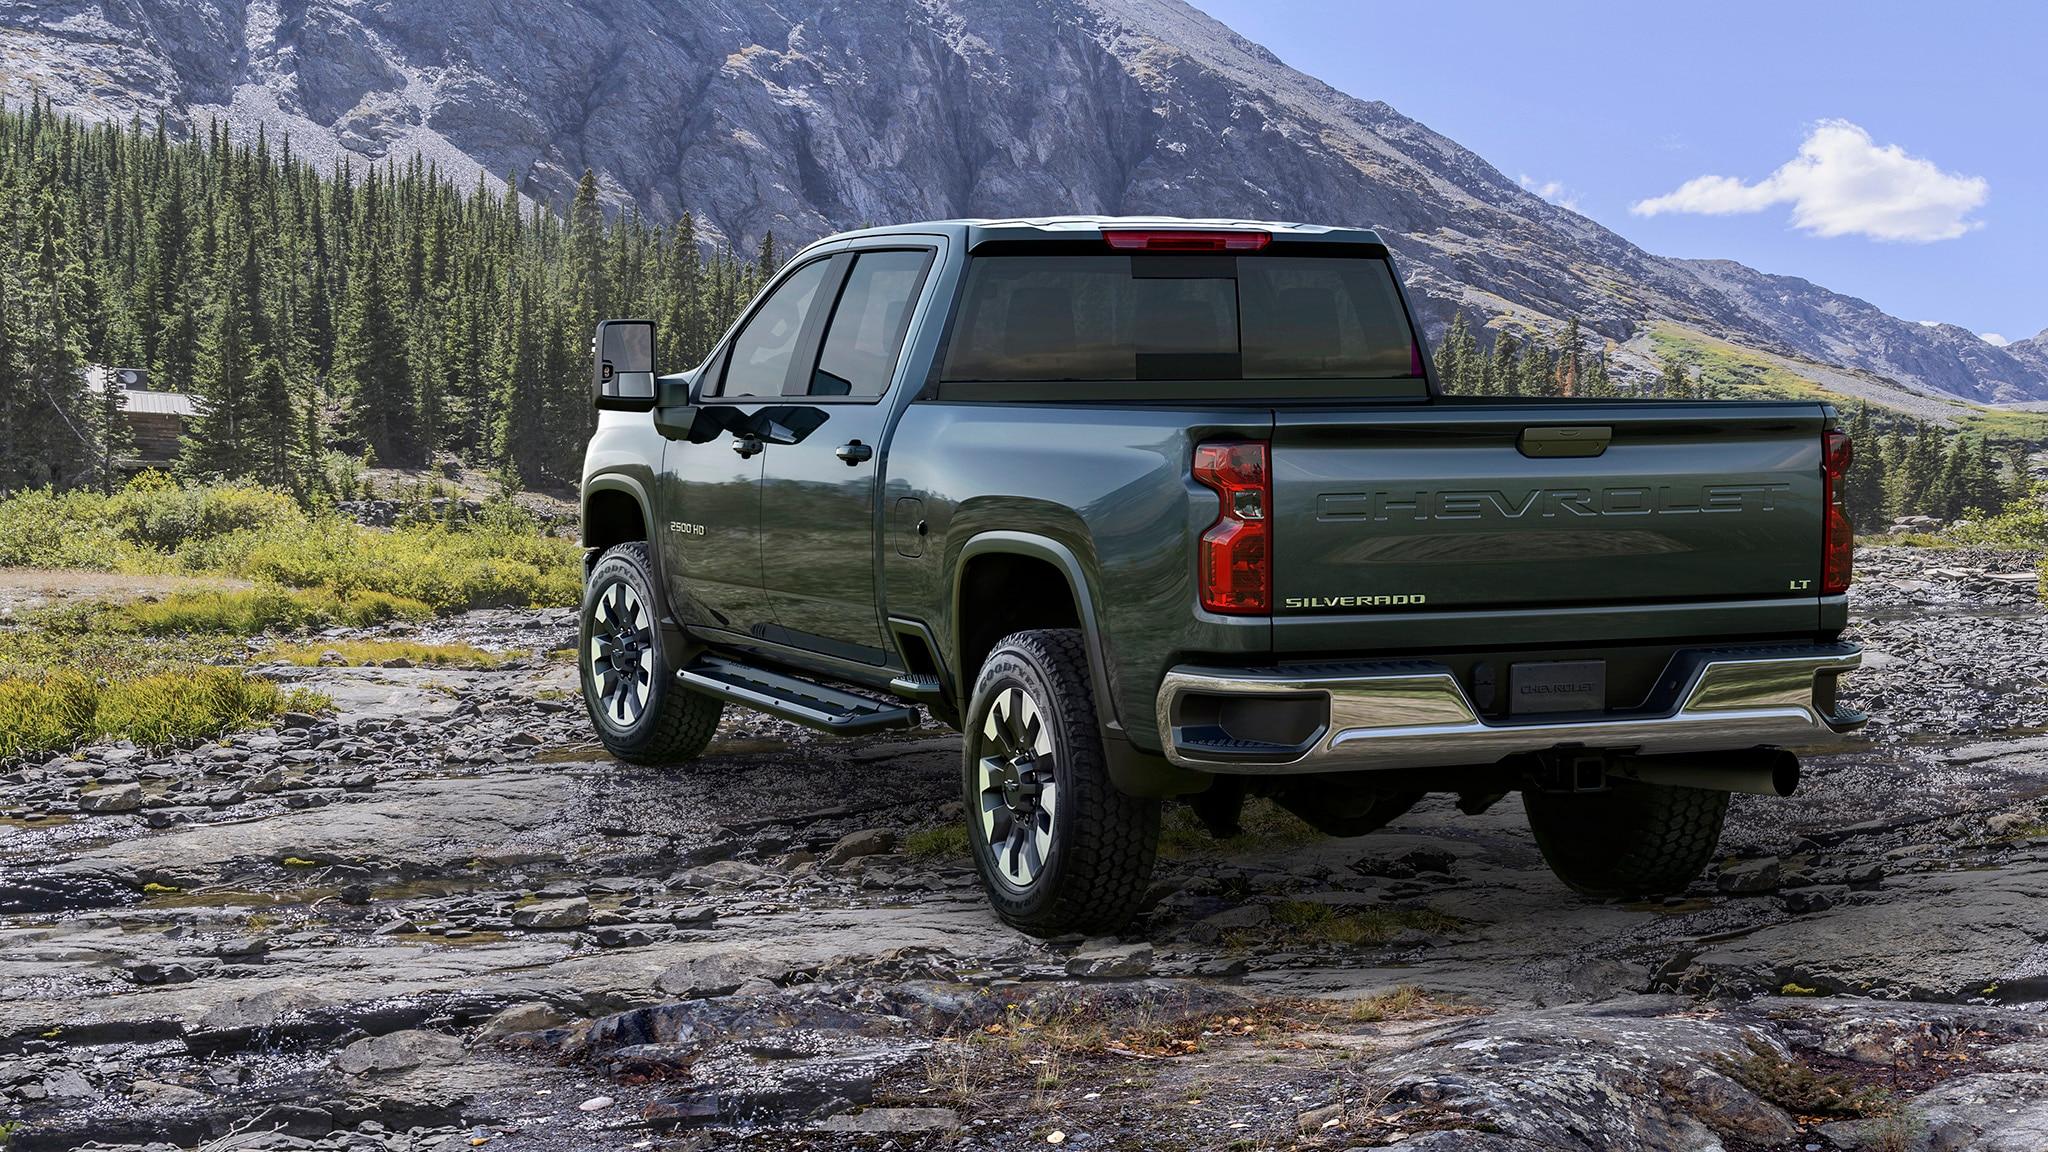 2020 Chevrolet Silverado 2500HD/3500HD First Drive: Tow